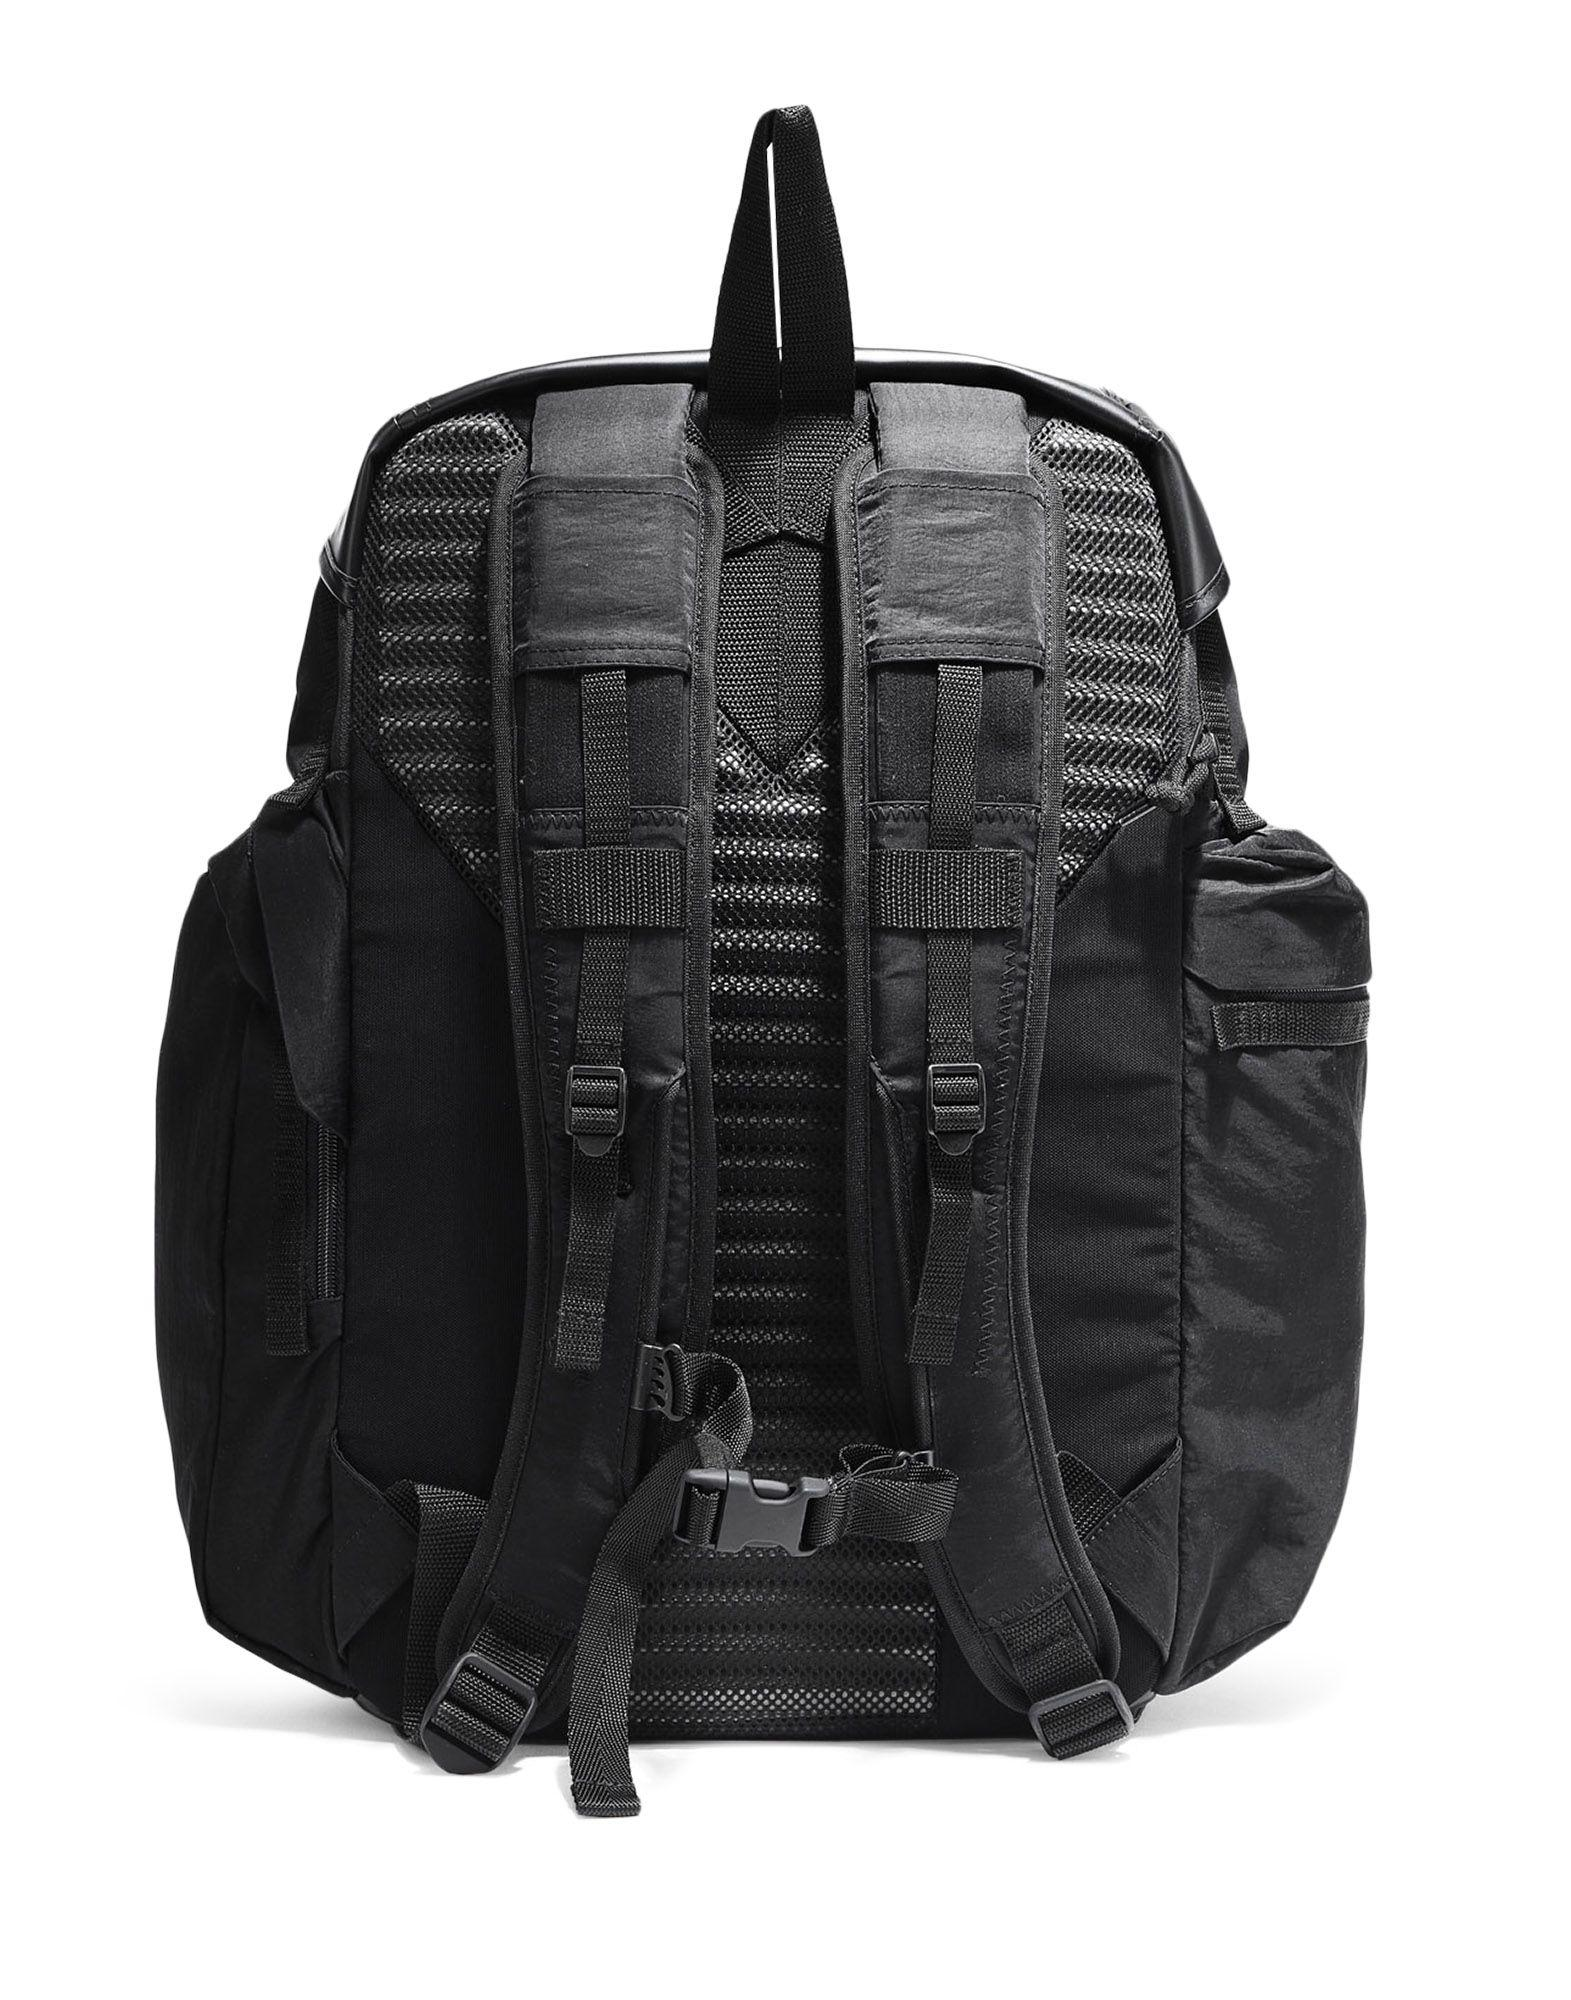 Y-3 Mobility Bag in Black for Men - Lyst 9559bc45c1021